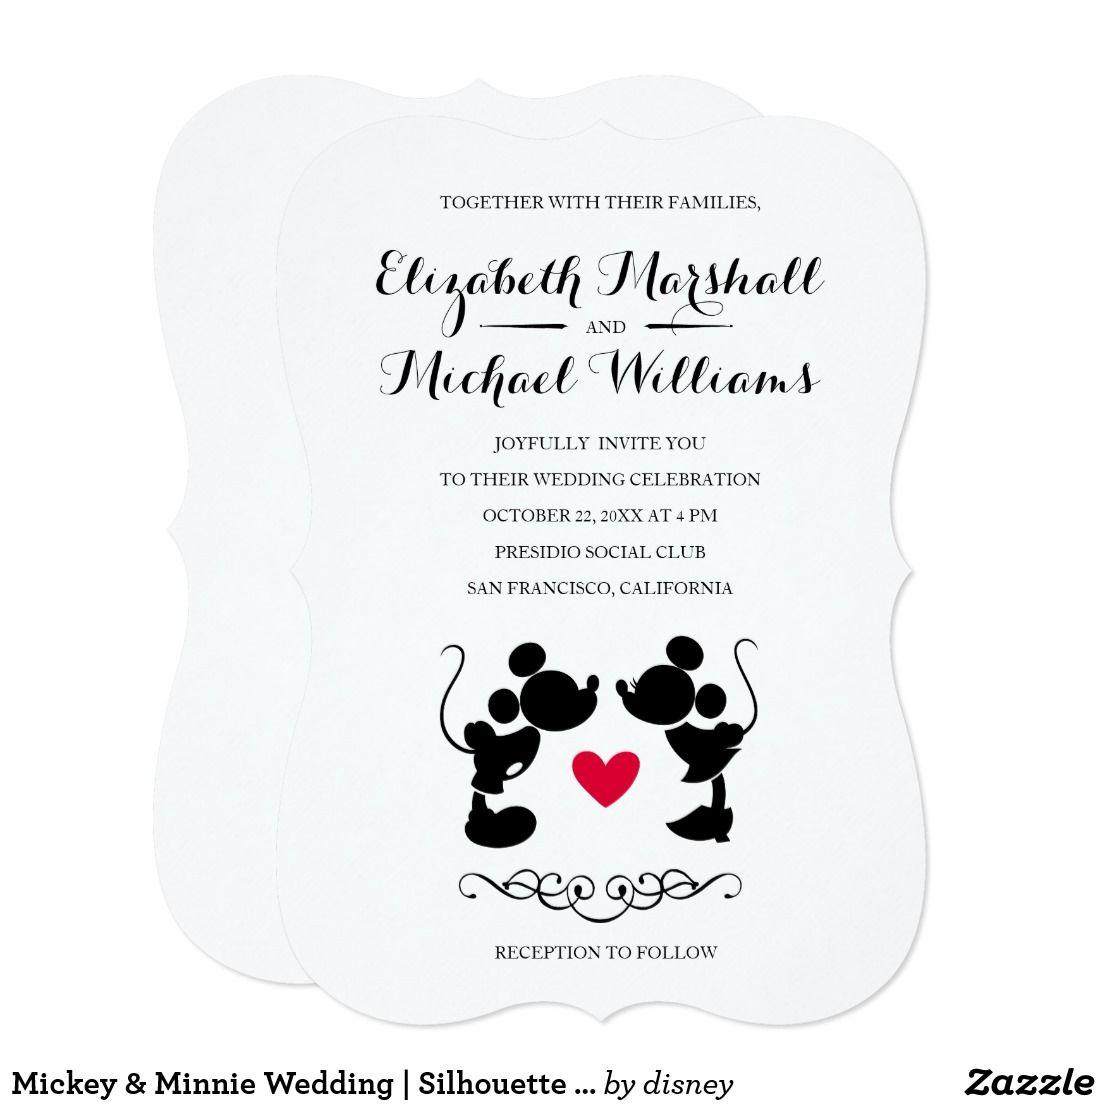 Mickey & Minnie Wedding | Silhouette Invitation | Wedding Invites ...